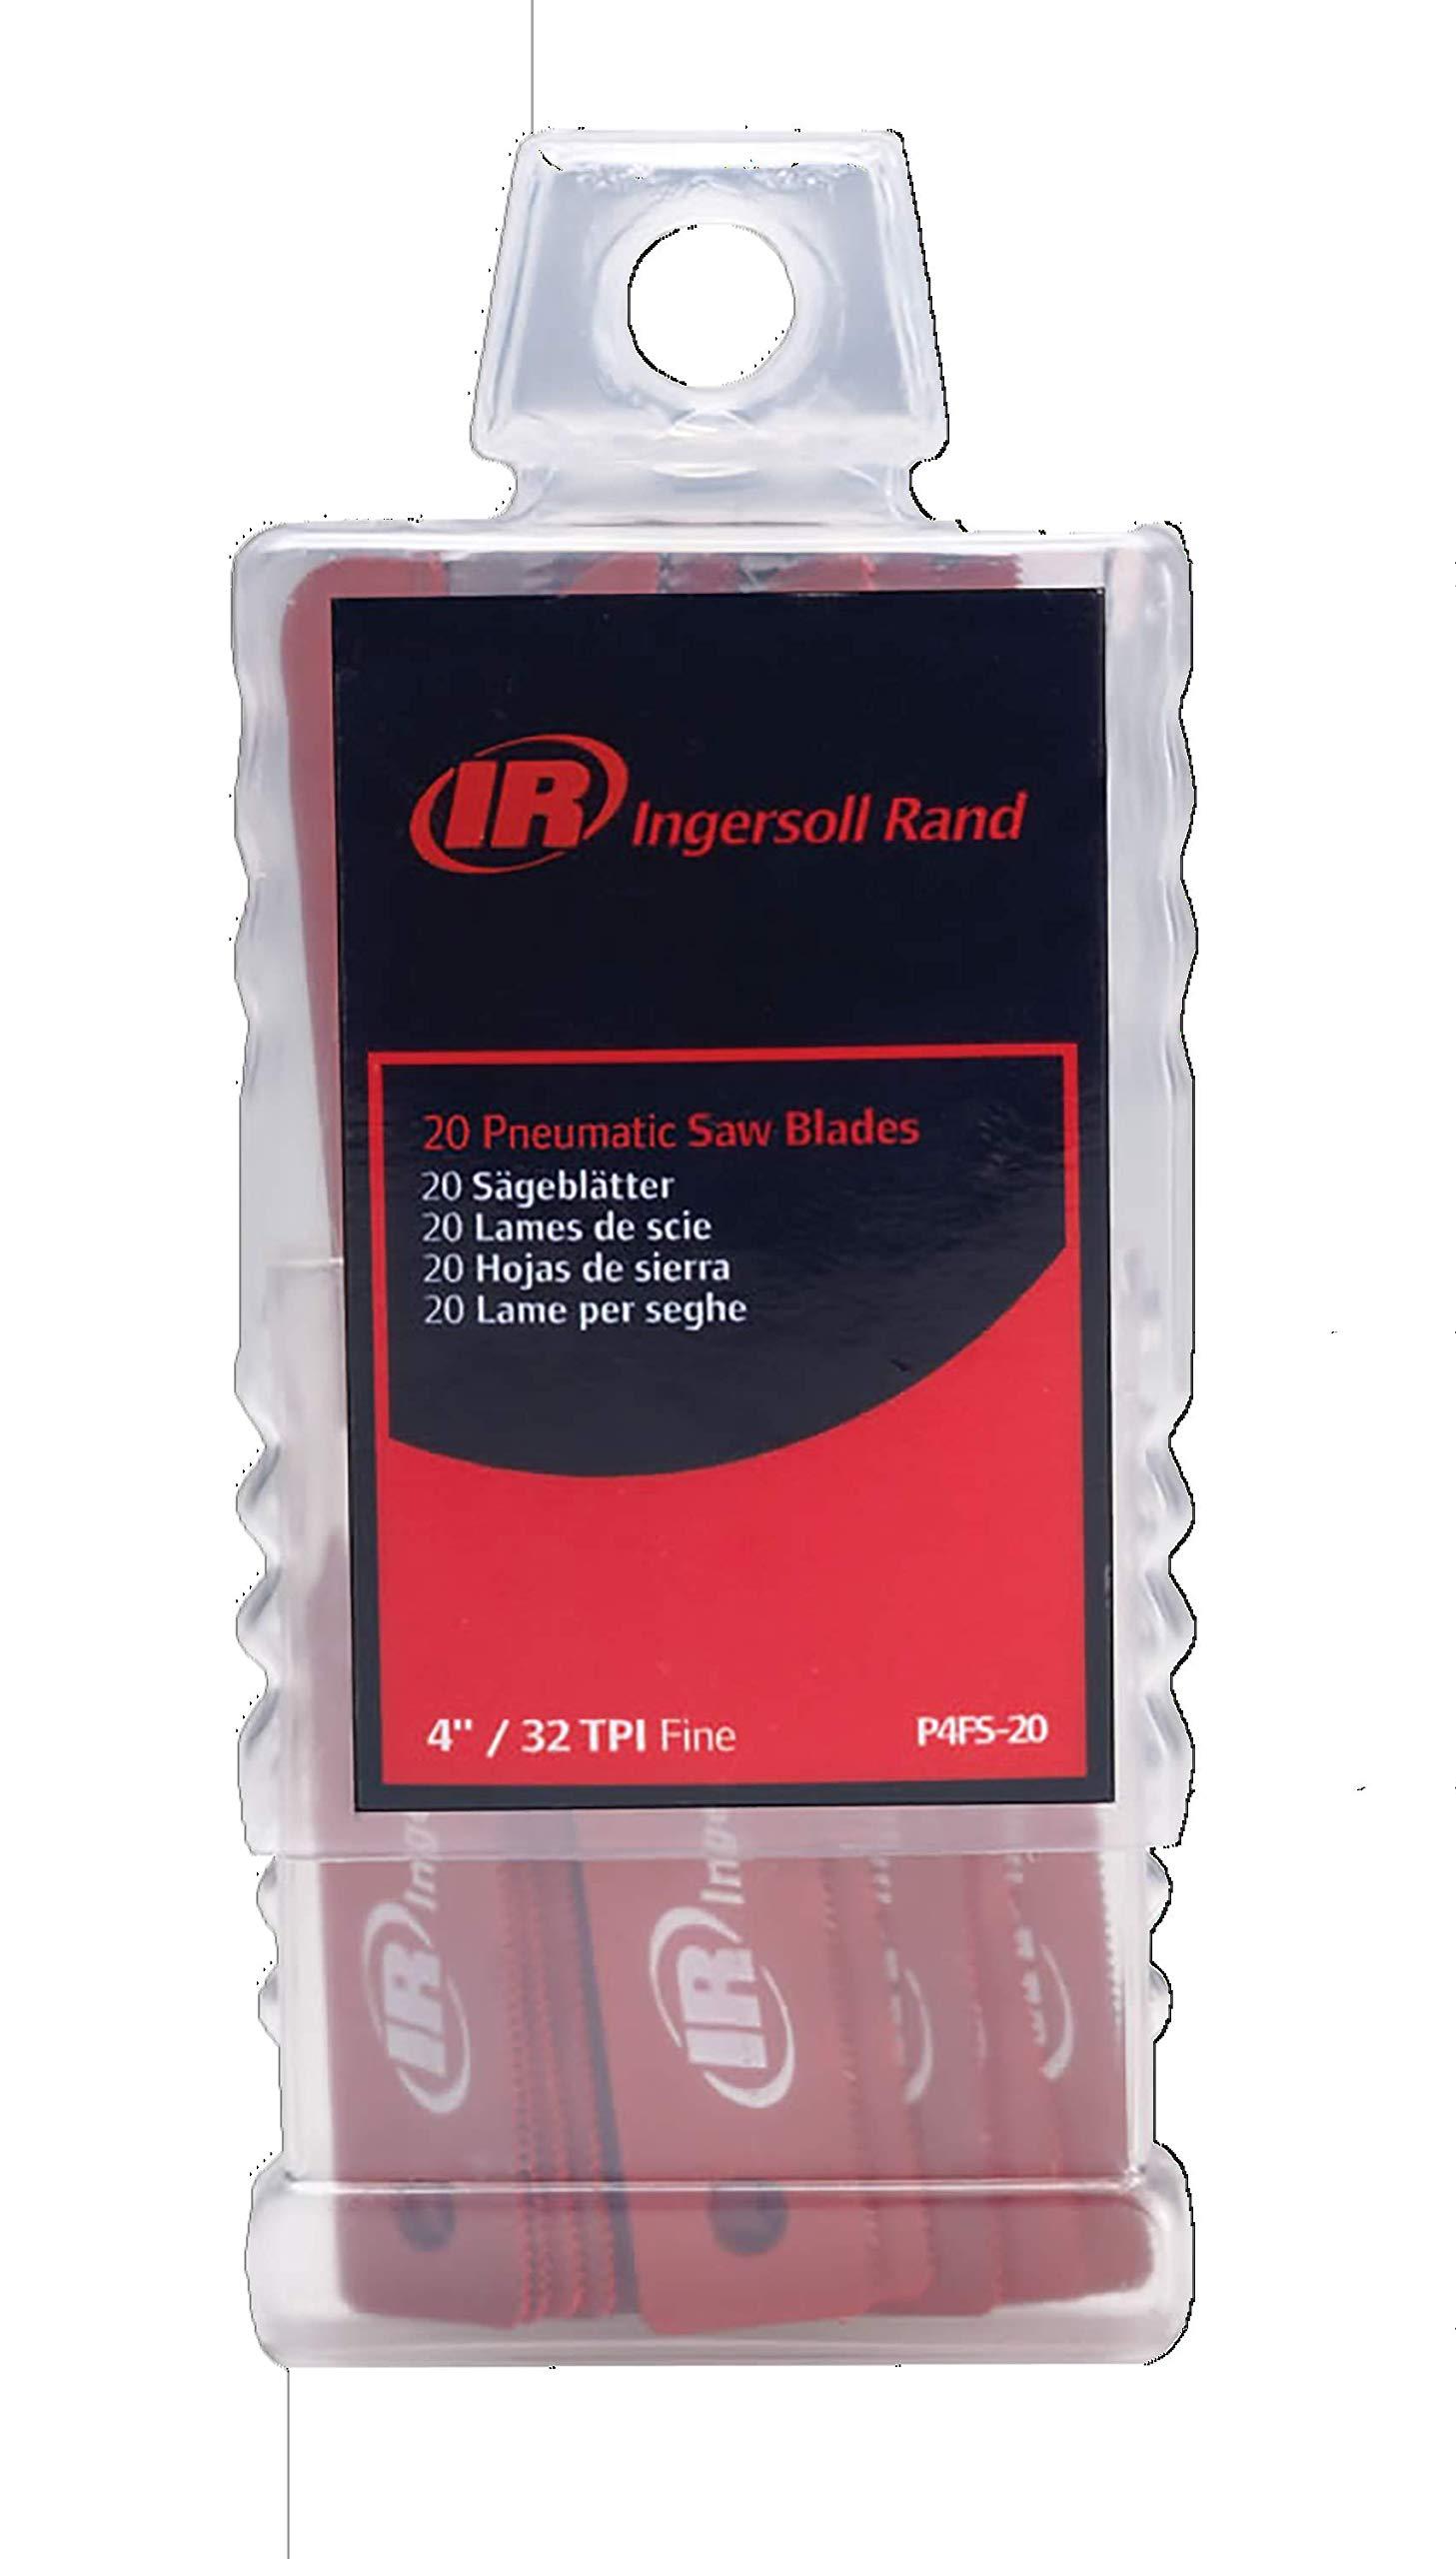 Ingersoll Rand P4FS-20 Air Reciprocating Saw Blades for all standard shank air reciprocating saws by Ingersoll Rand